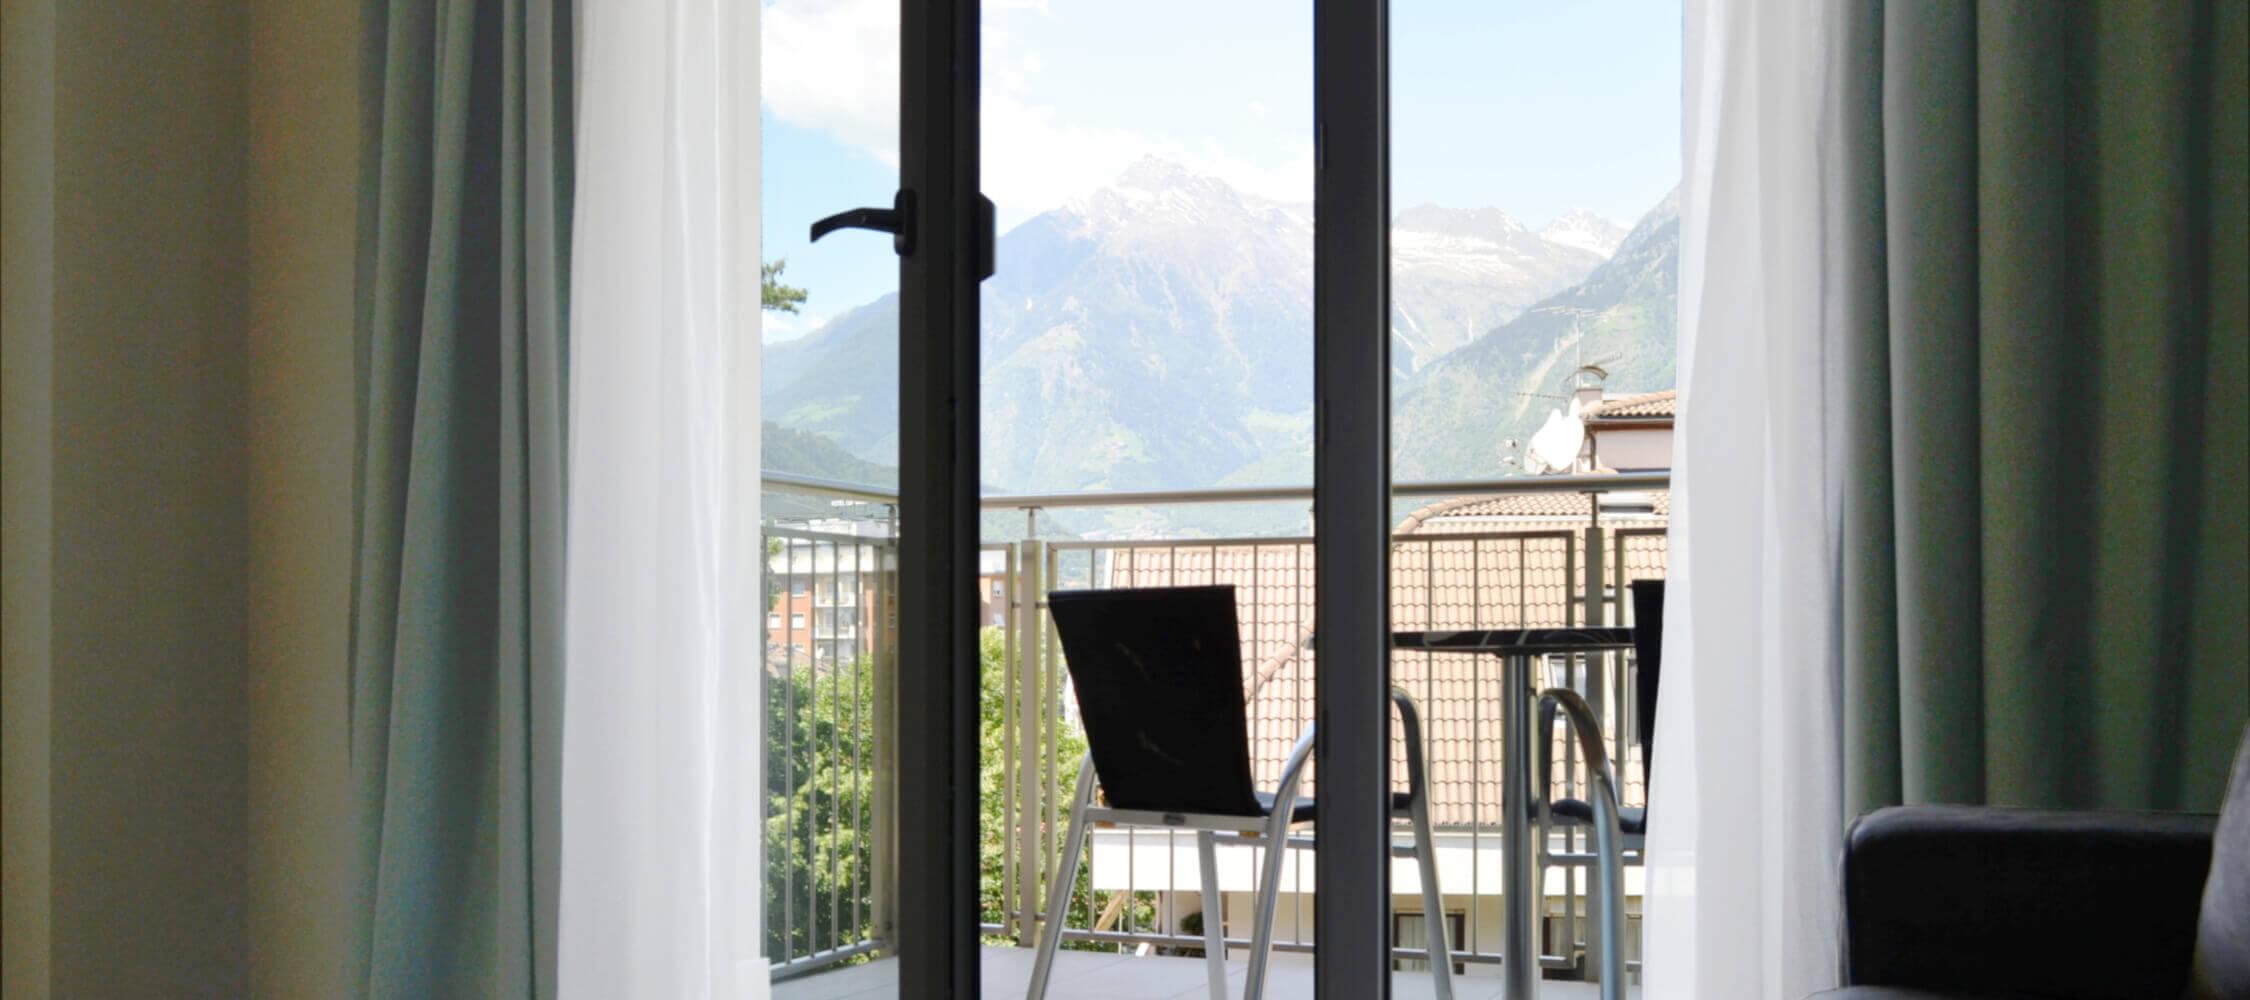 City_Hotel_Merano_Suite_City_2_Raum_Balkon DSC_0587_2250x1000